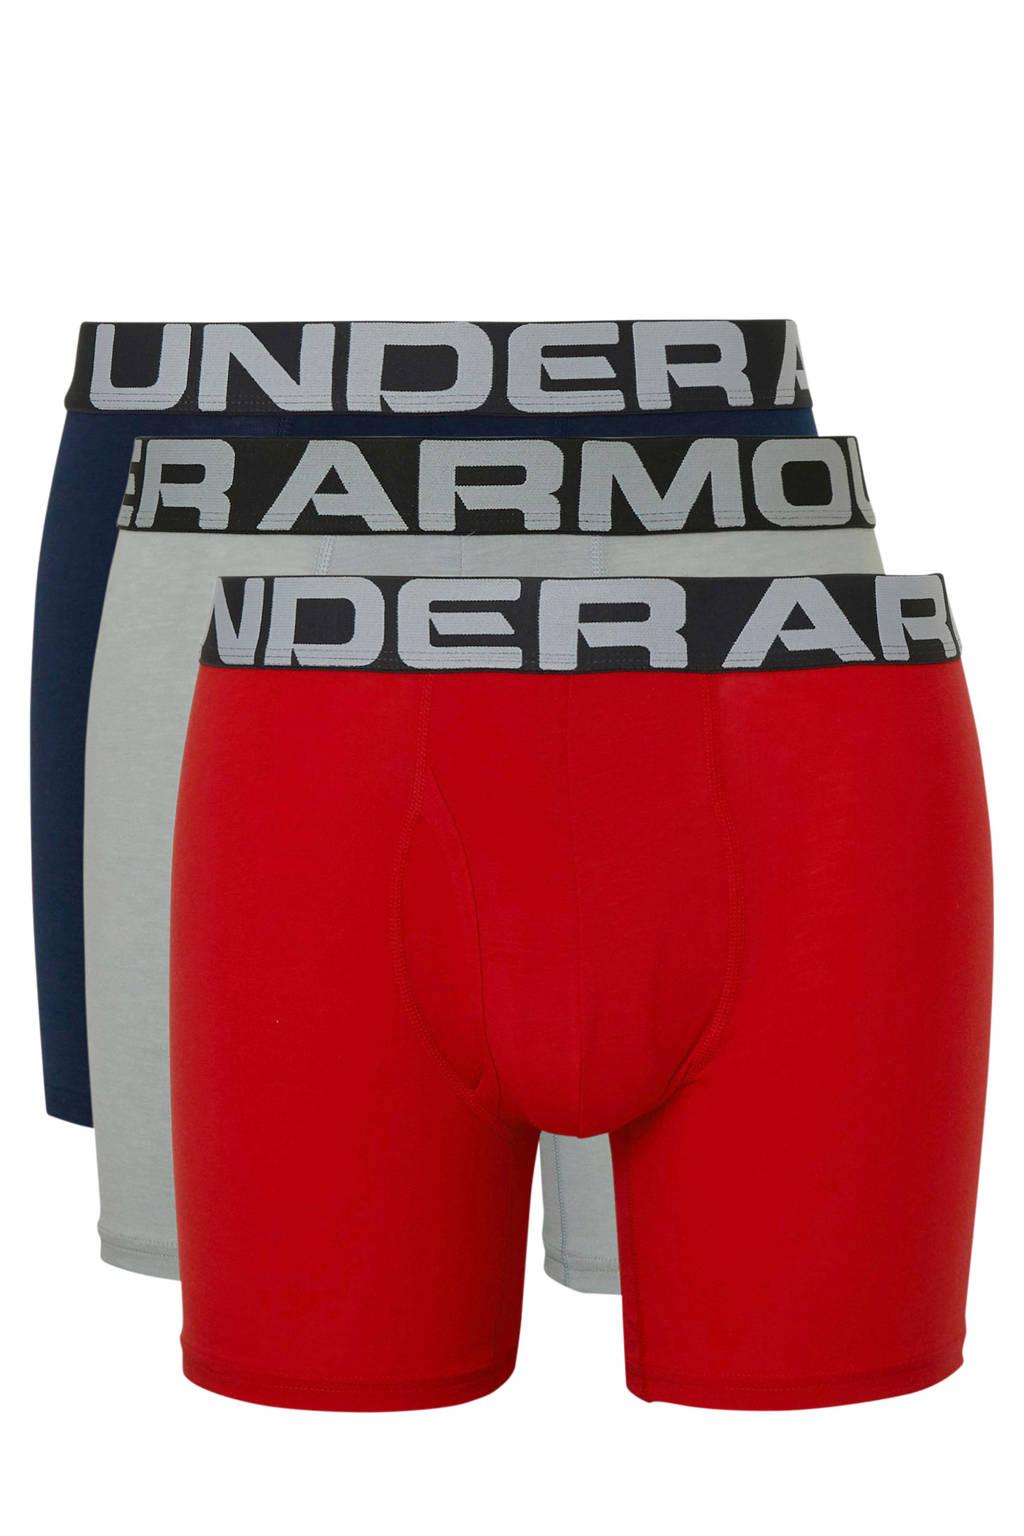 Under Armour sportboxer (set van 3), Rood/donkerblauw/lichtgrijs